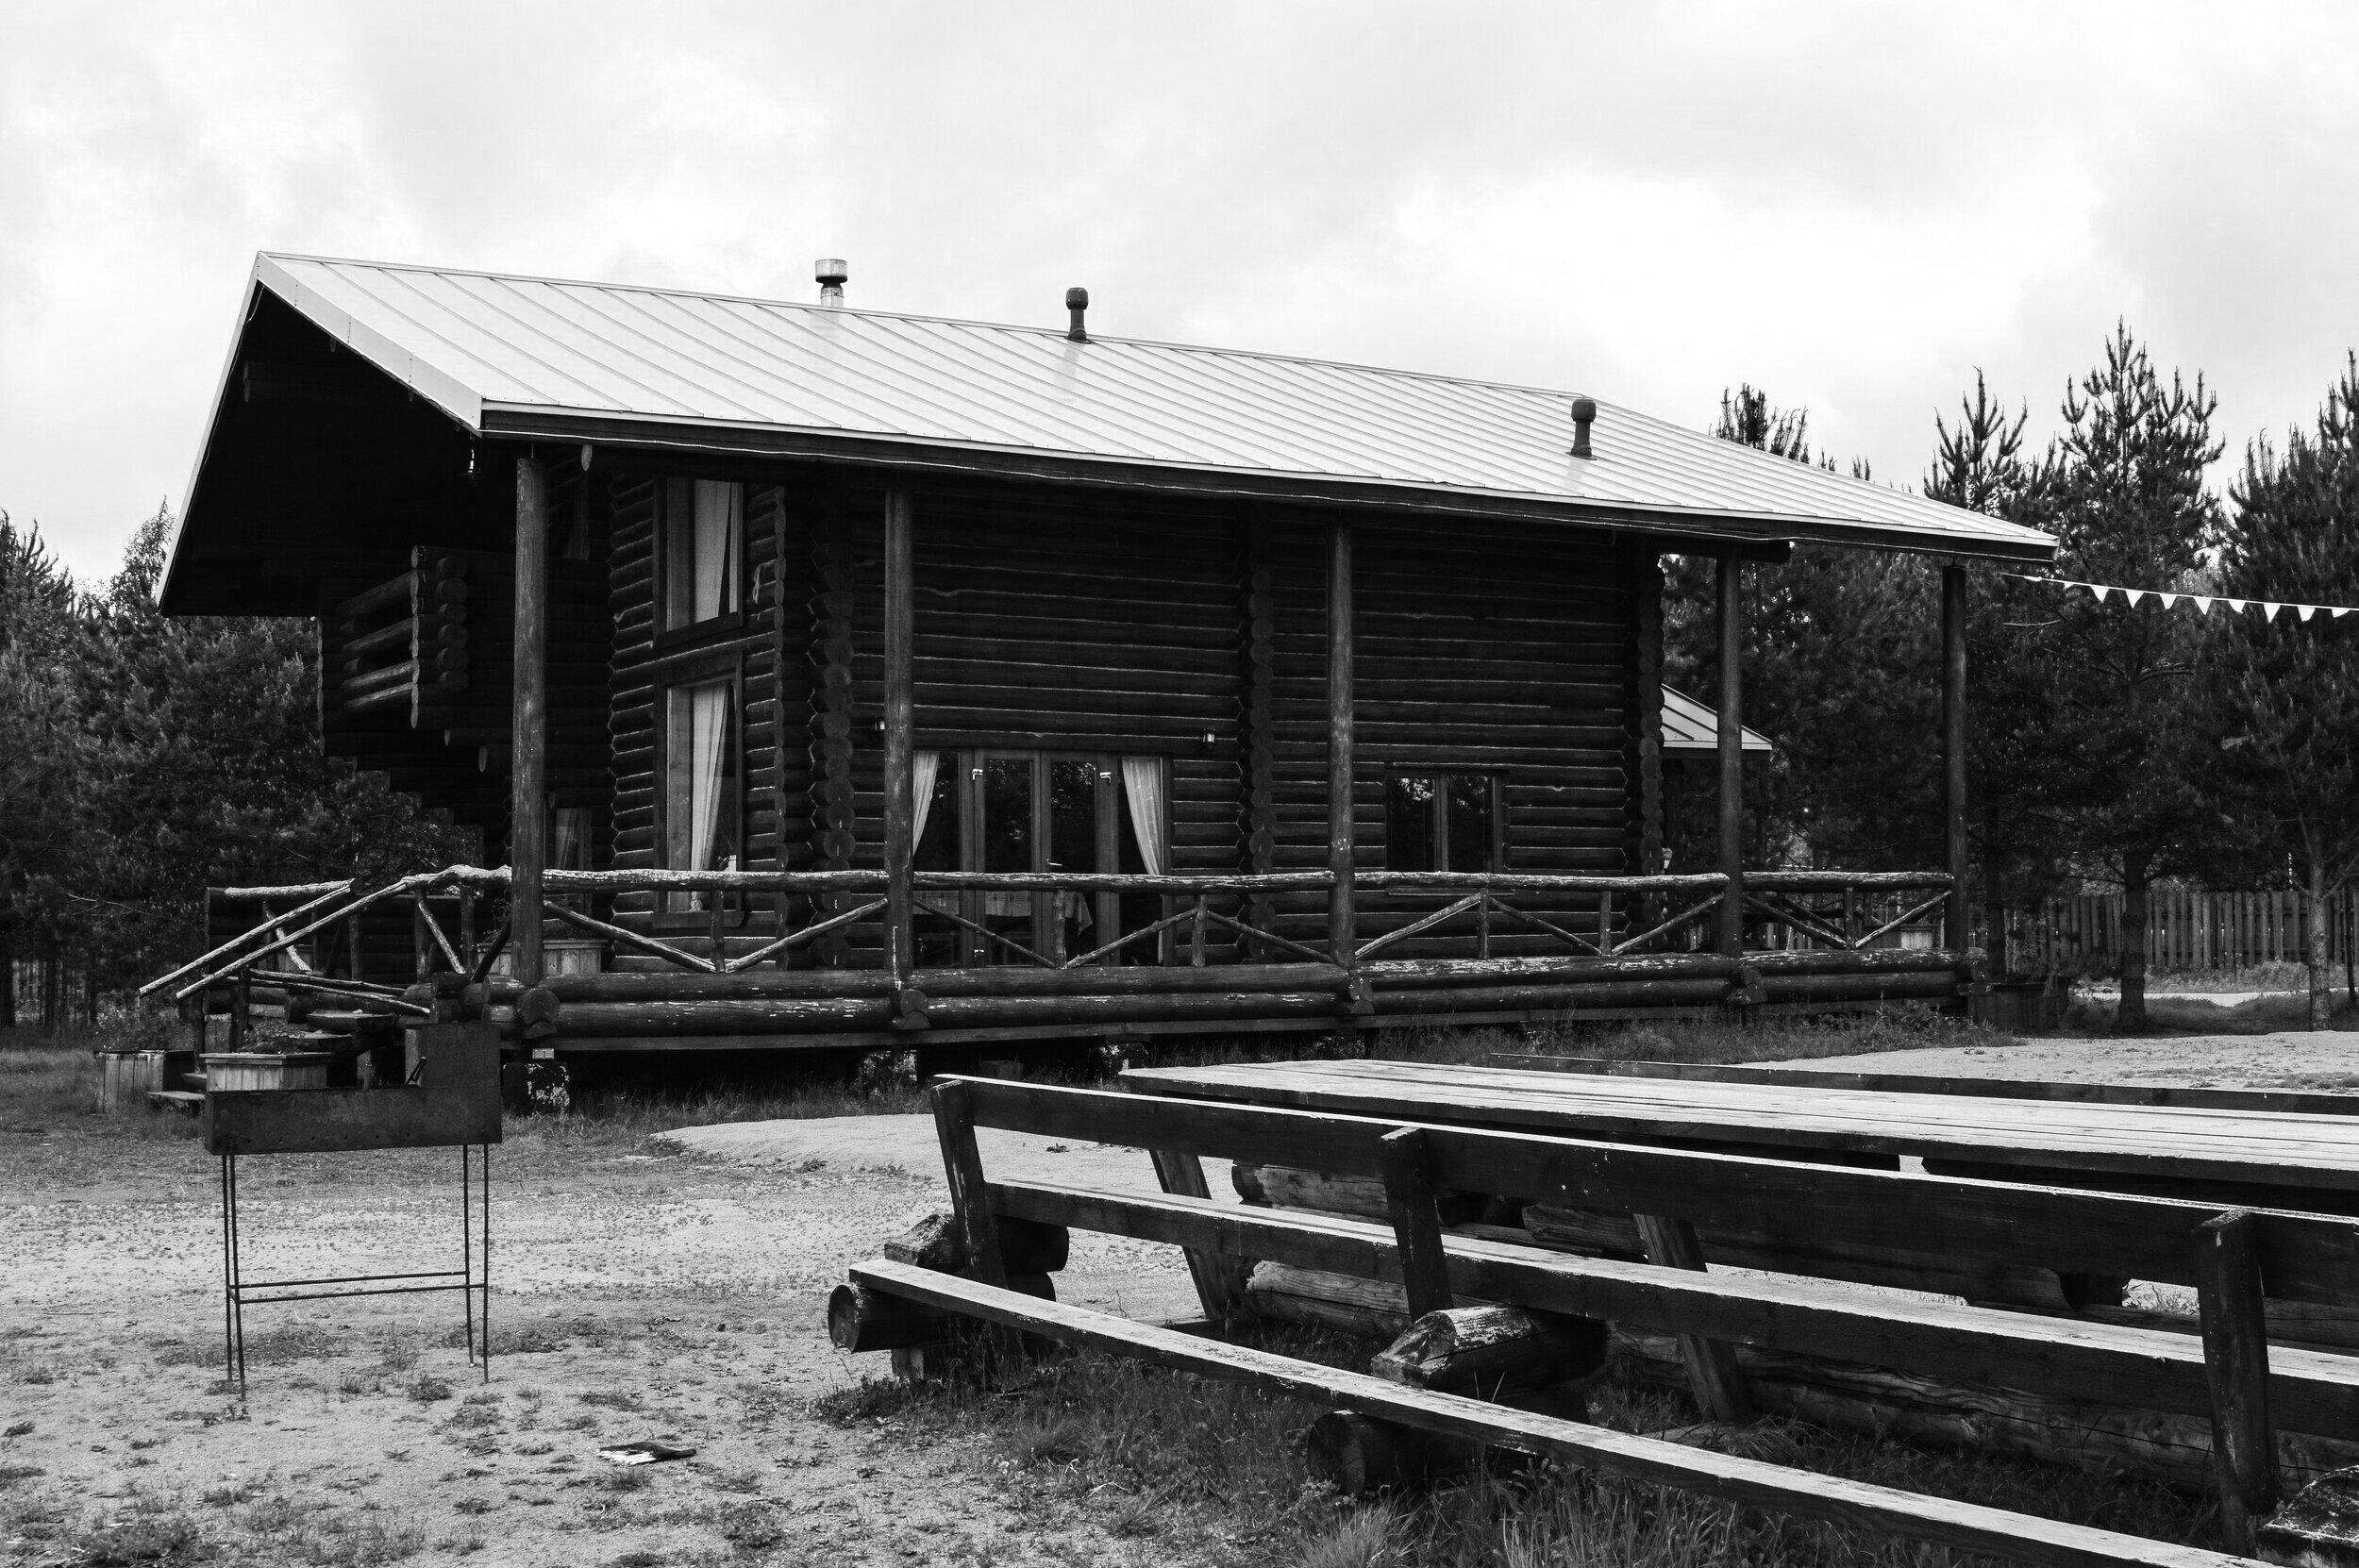 alaska-architecture-building-1565326.jpg